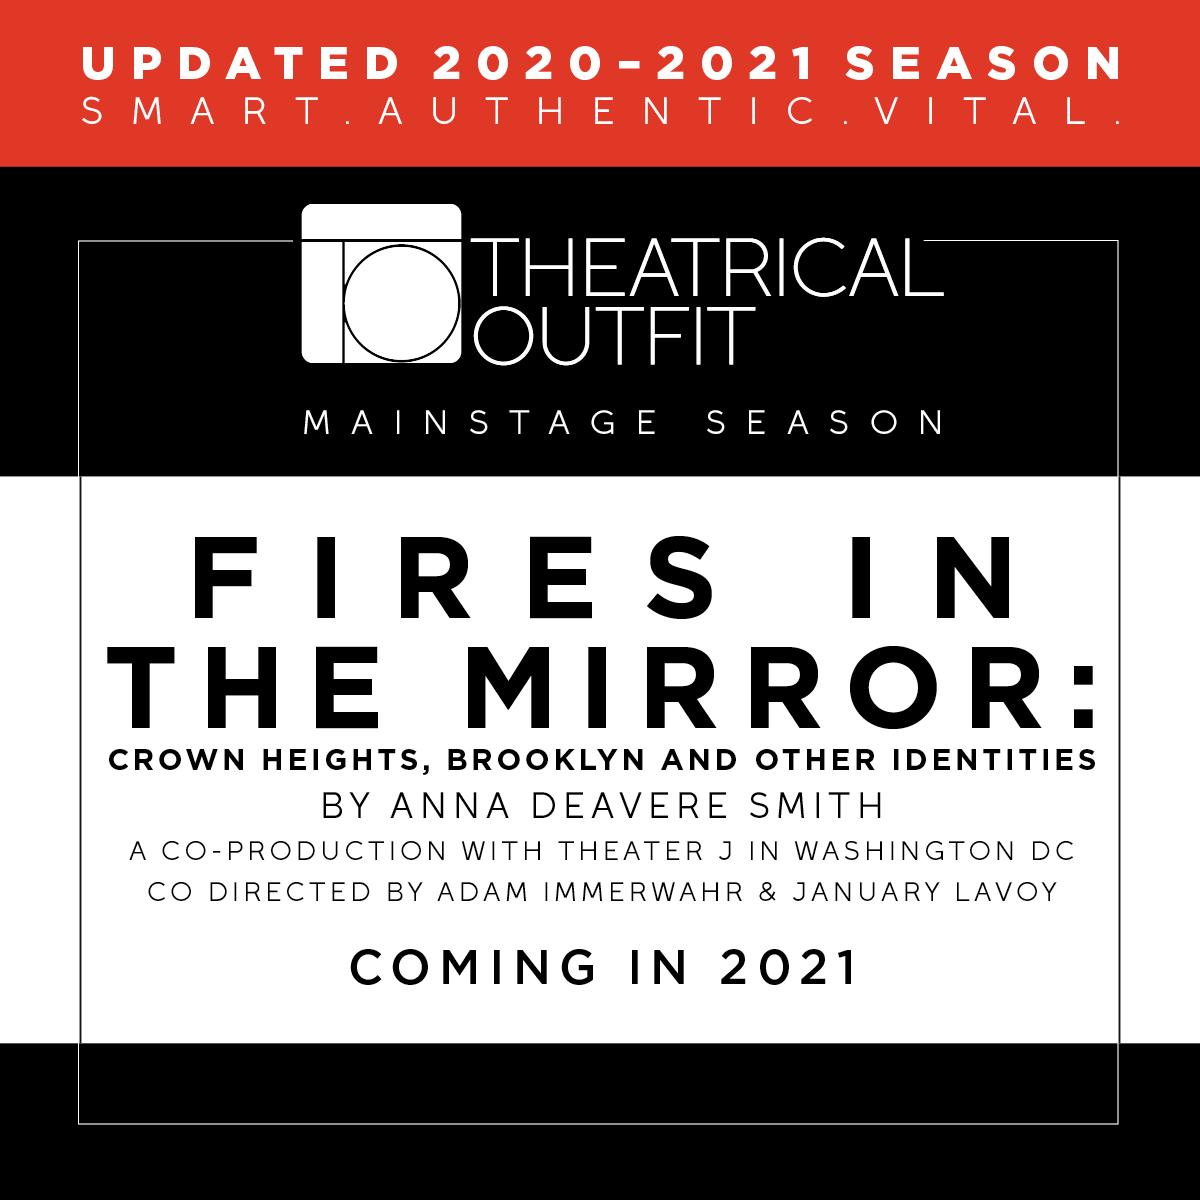 2020-21_TO_Season_SOCIAL_1200x1200_v1_MS-Fires